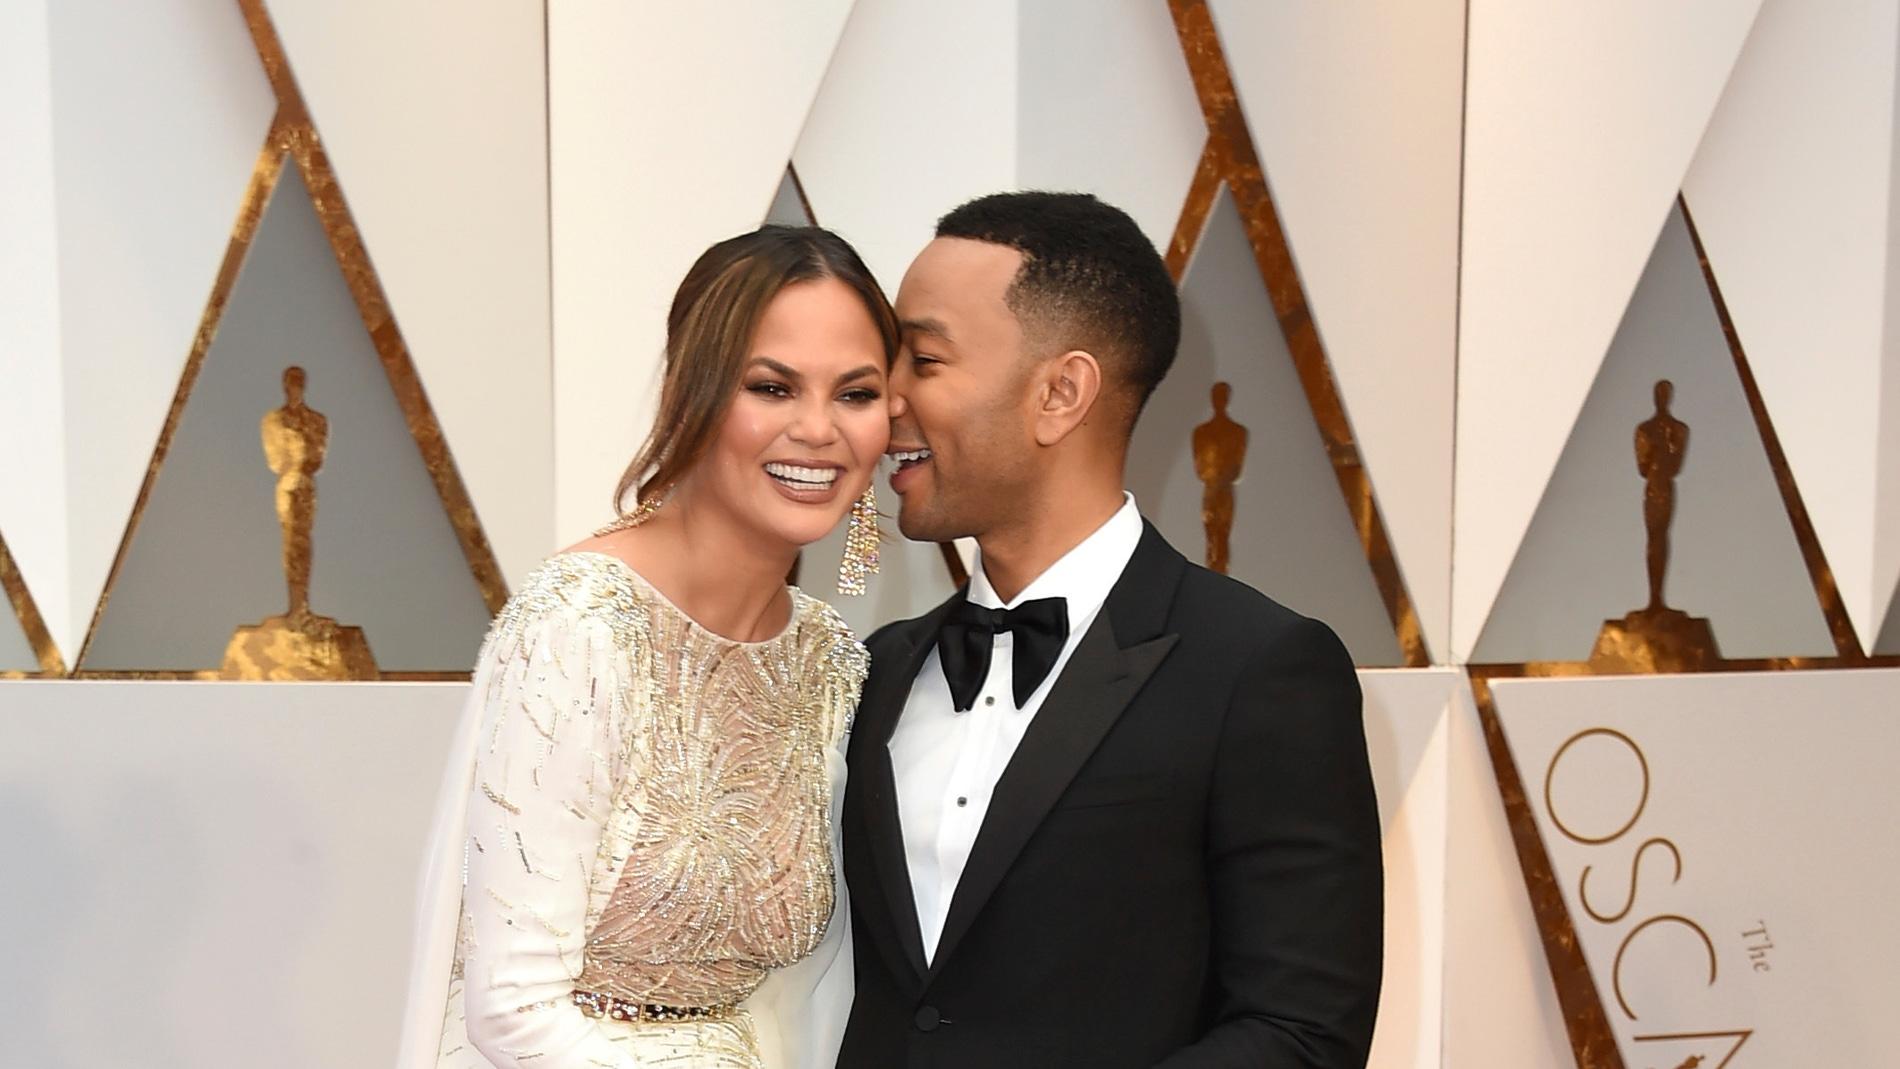 Chrissy Teigen y John Legend han desprendido amor sobre la alfombra roja